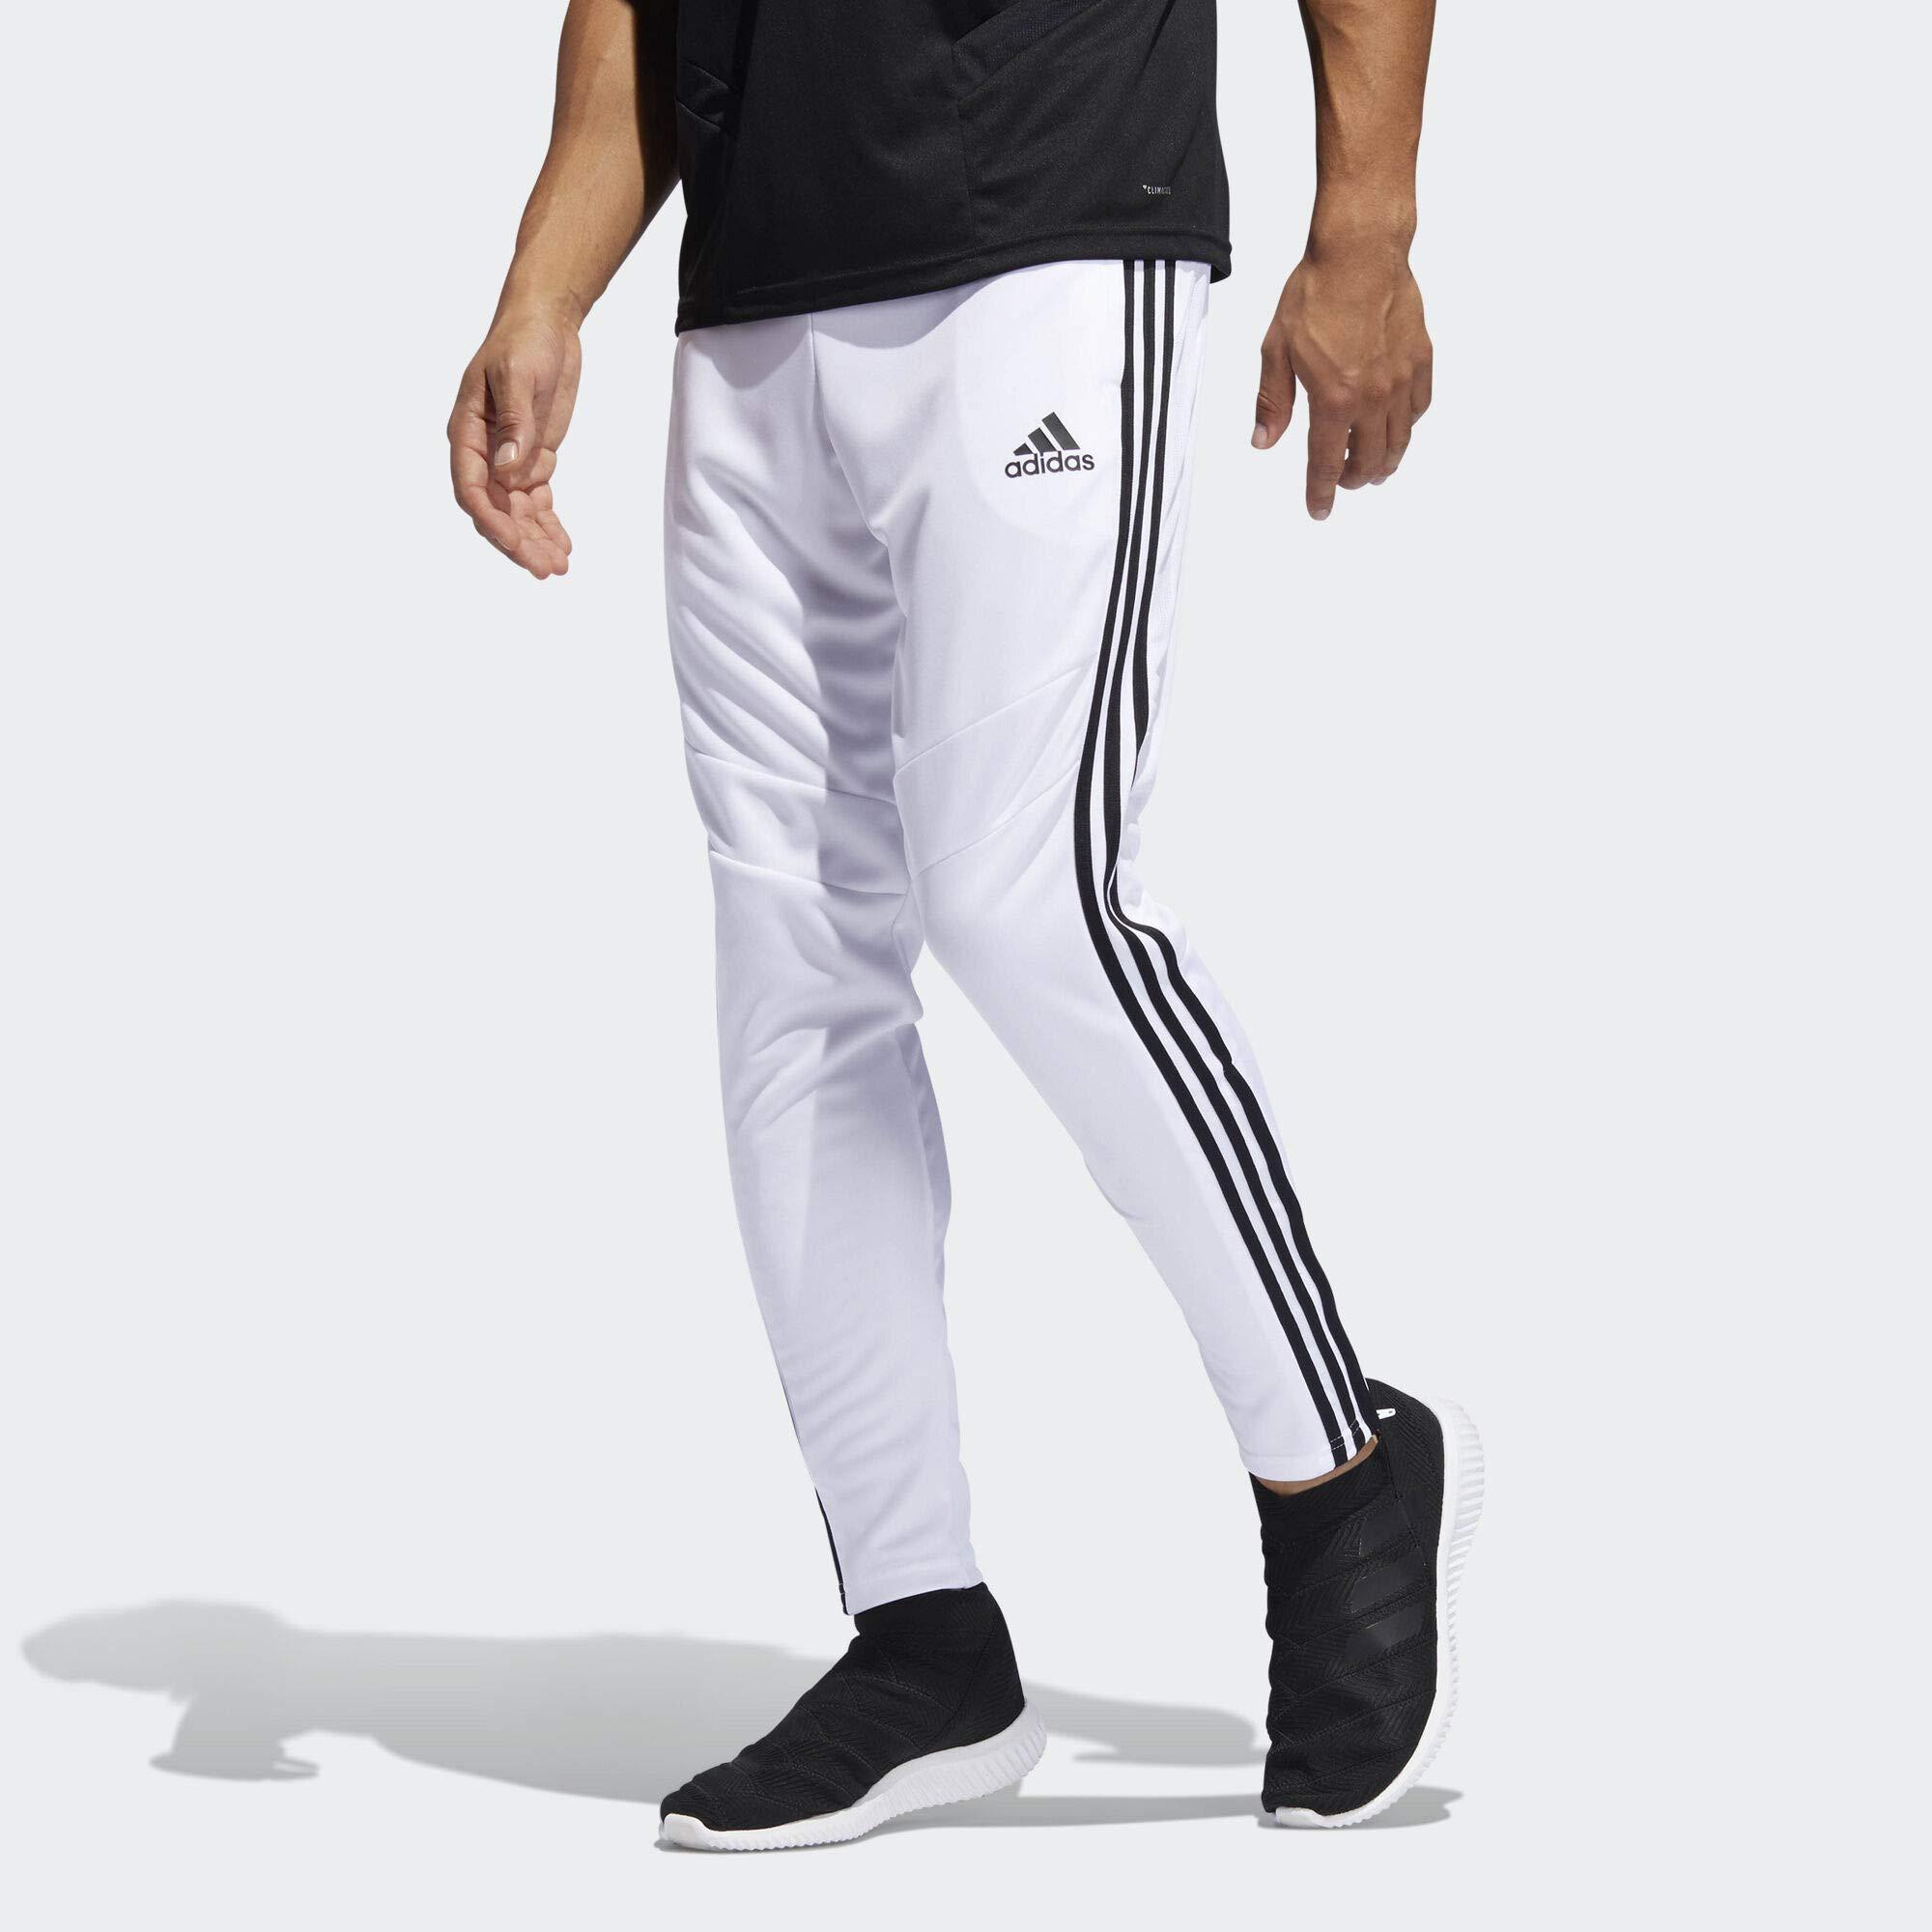 adidas Men's Tiro 19 Training Soccer Pants, Tiro '19 Pants, White/Black, XX-Large by adidas